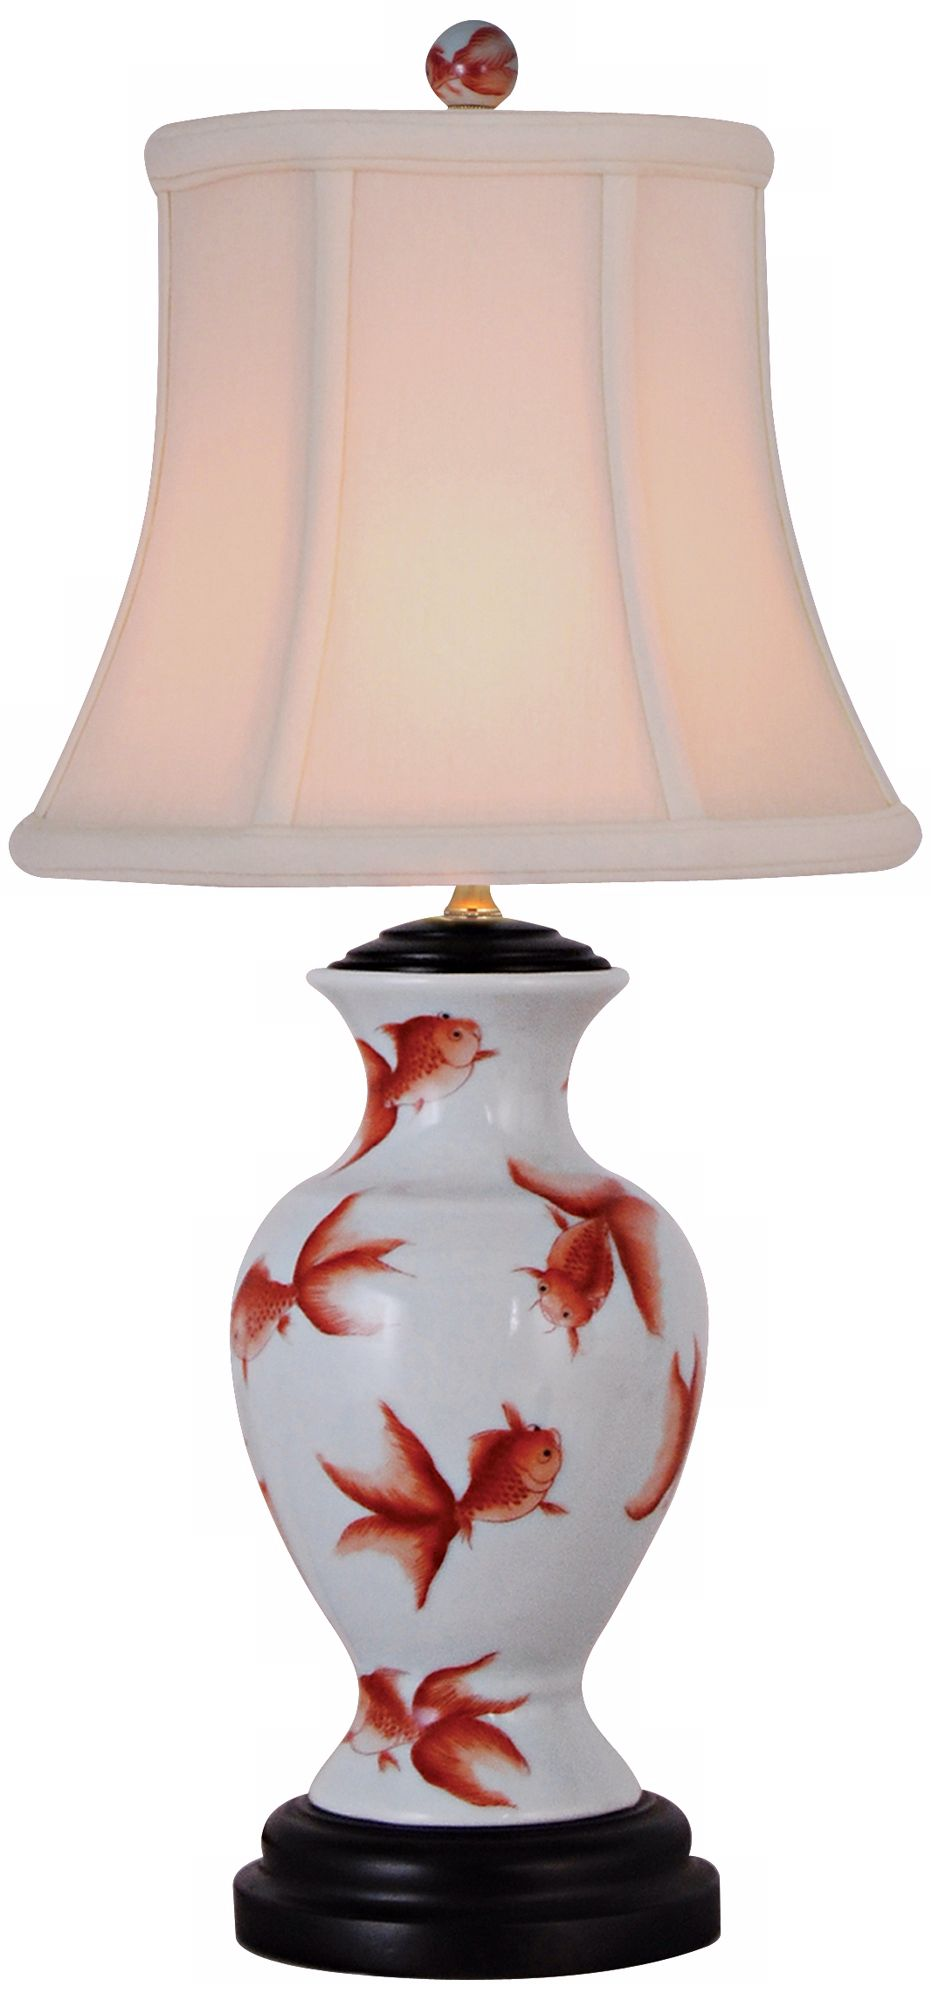 goldfish mini vase porcelain accent table lamp lamps allen jones wine cupboard dark brown backyard and chairs pulaski convertible sofa bunnings outdoor storage half moon mirrored